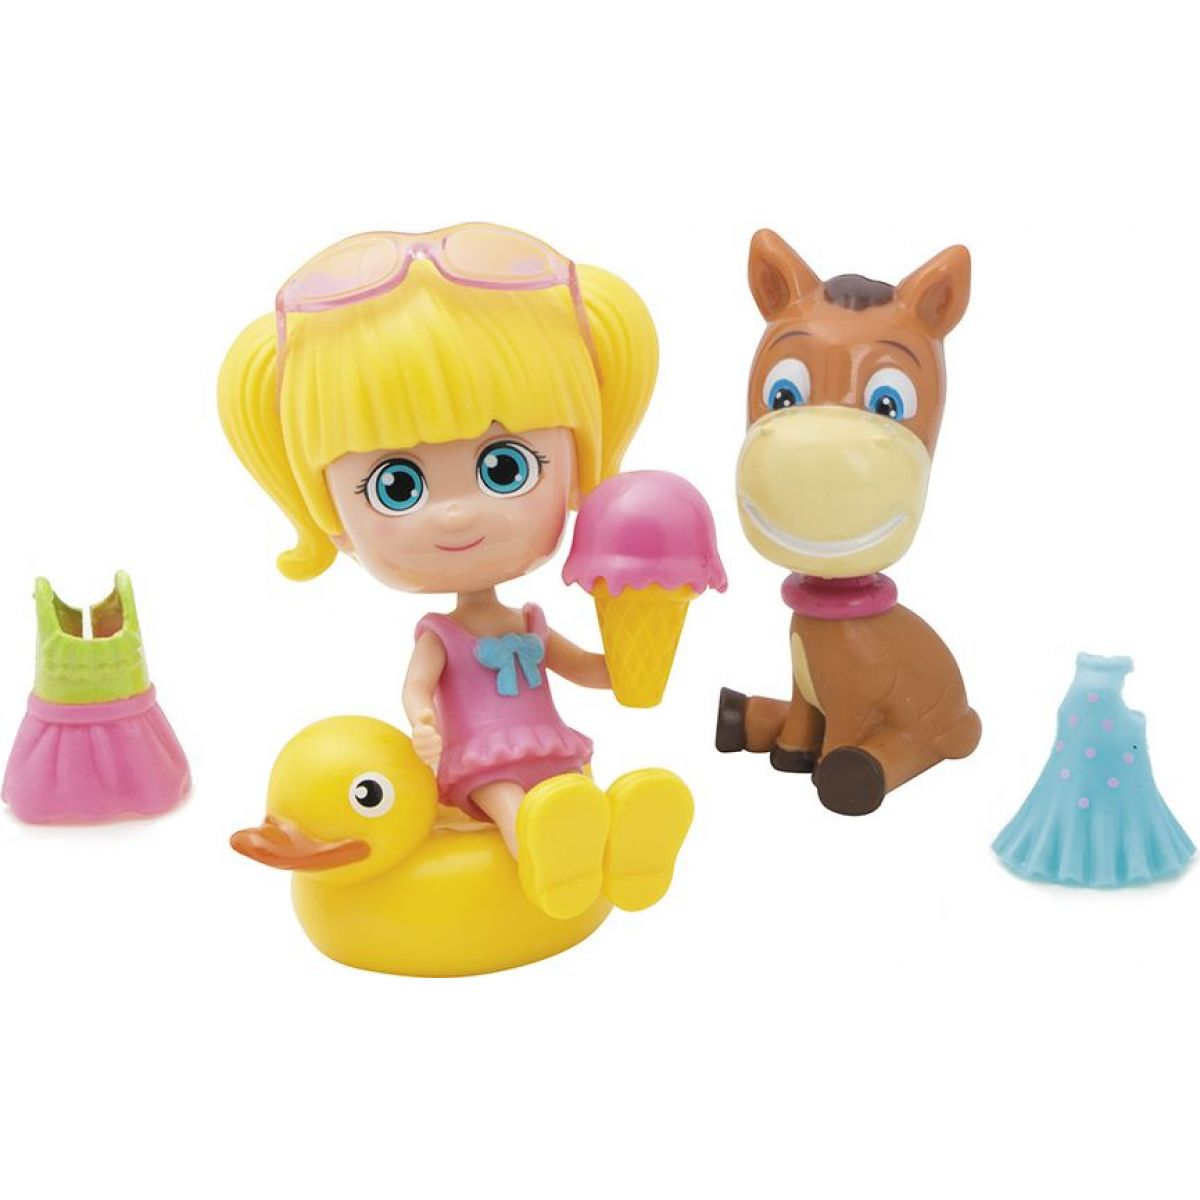 Paula & Friends bábika s doplnkami a zvieratkom oslík